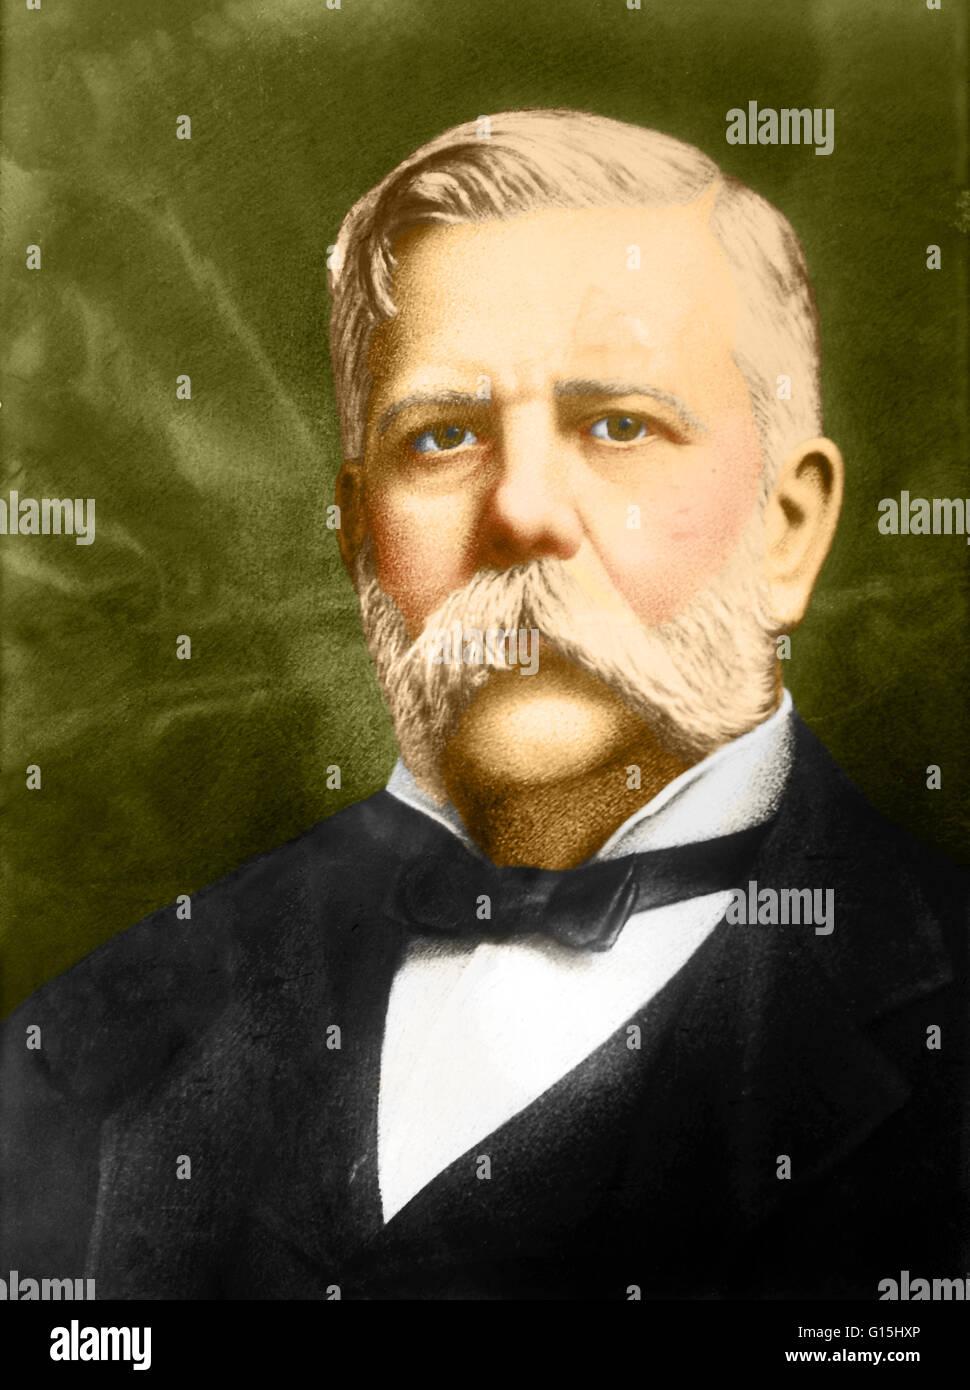 george westinghouse George westinghouse, jr (central bridge, nova york, 6 d'octubre de 1846 - id, 12 de març de 1914), inventor estatunidenc, va ser el principal responsable de l.